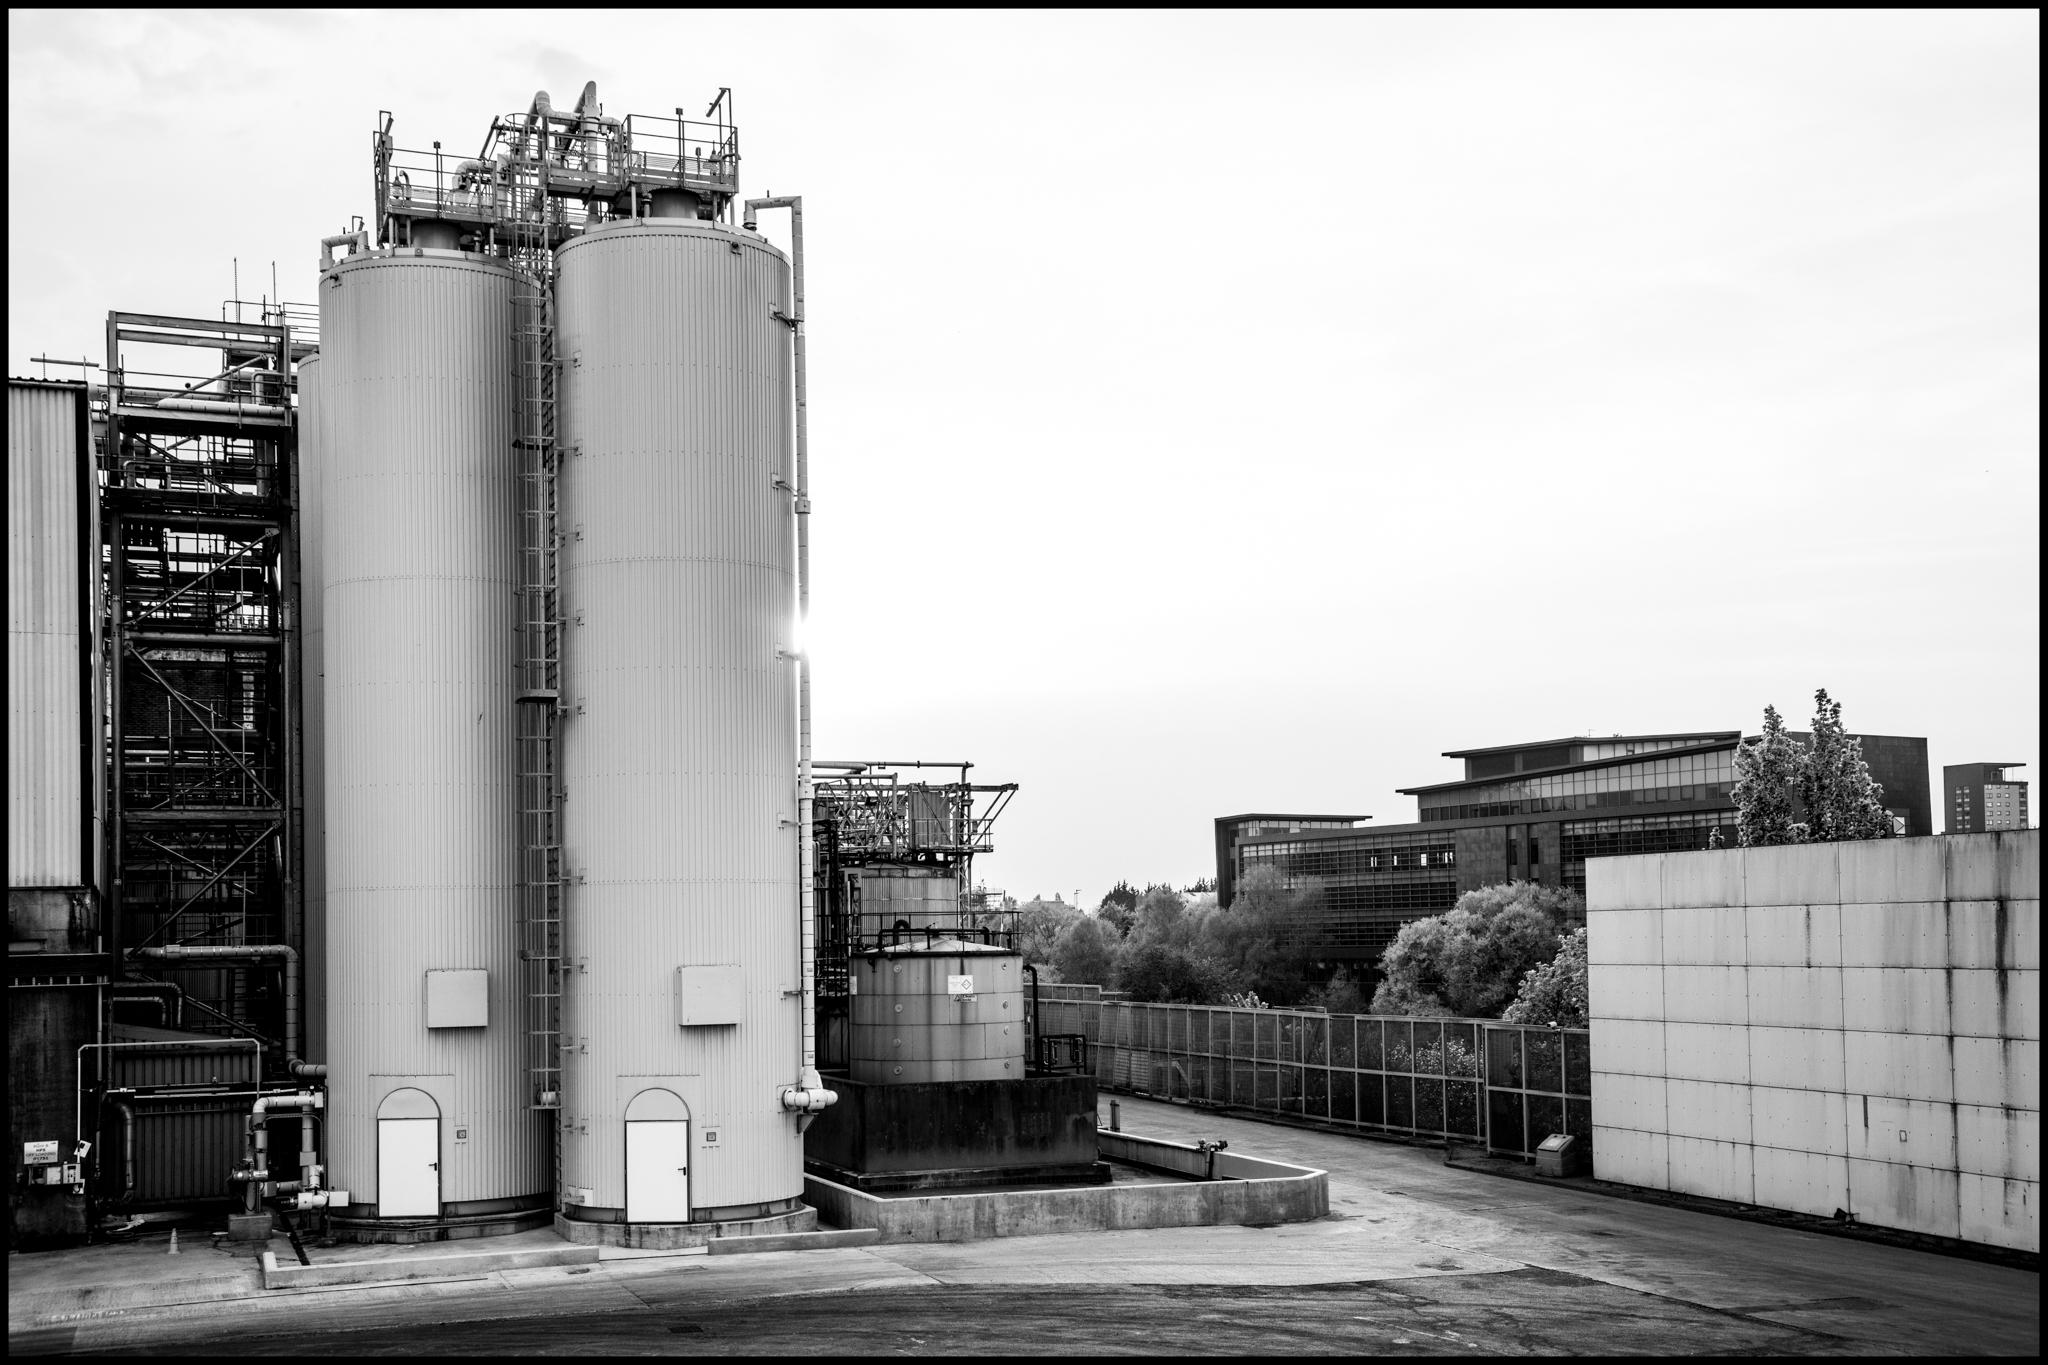 28 April 2019 - Factory #2, Trafford UK